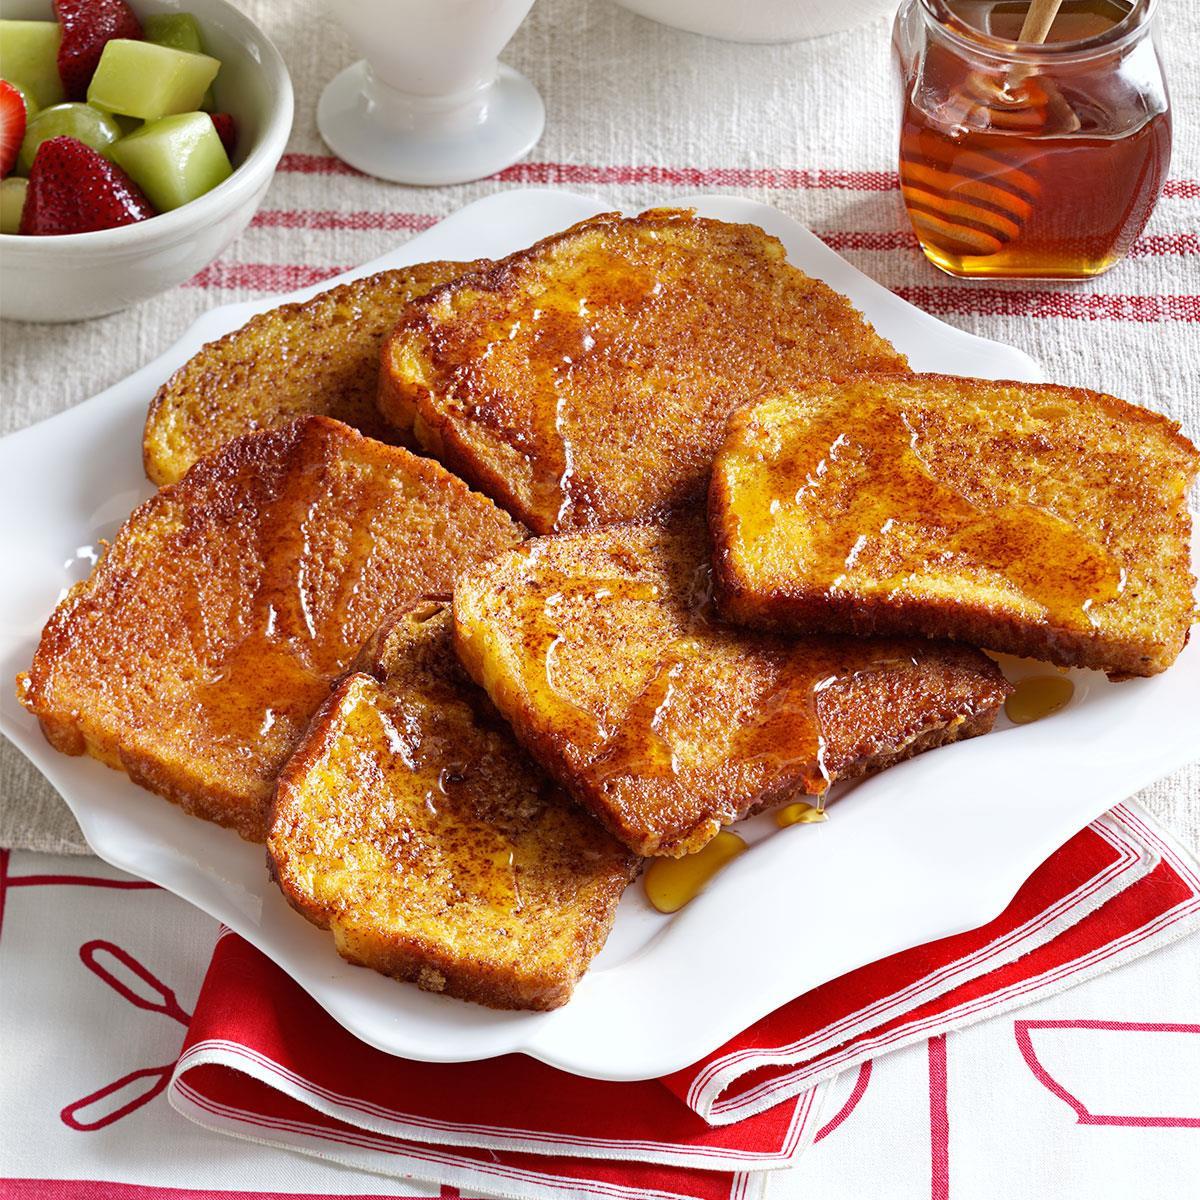 French Toast Recipie  Orange Cinnamon French Toast Recipe